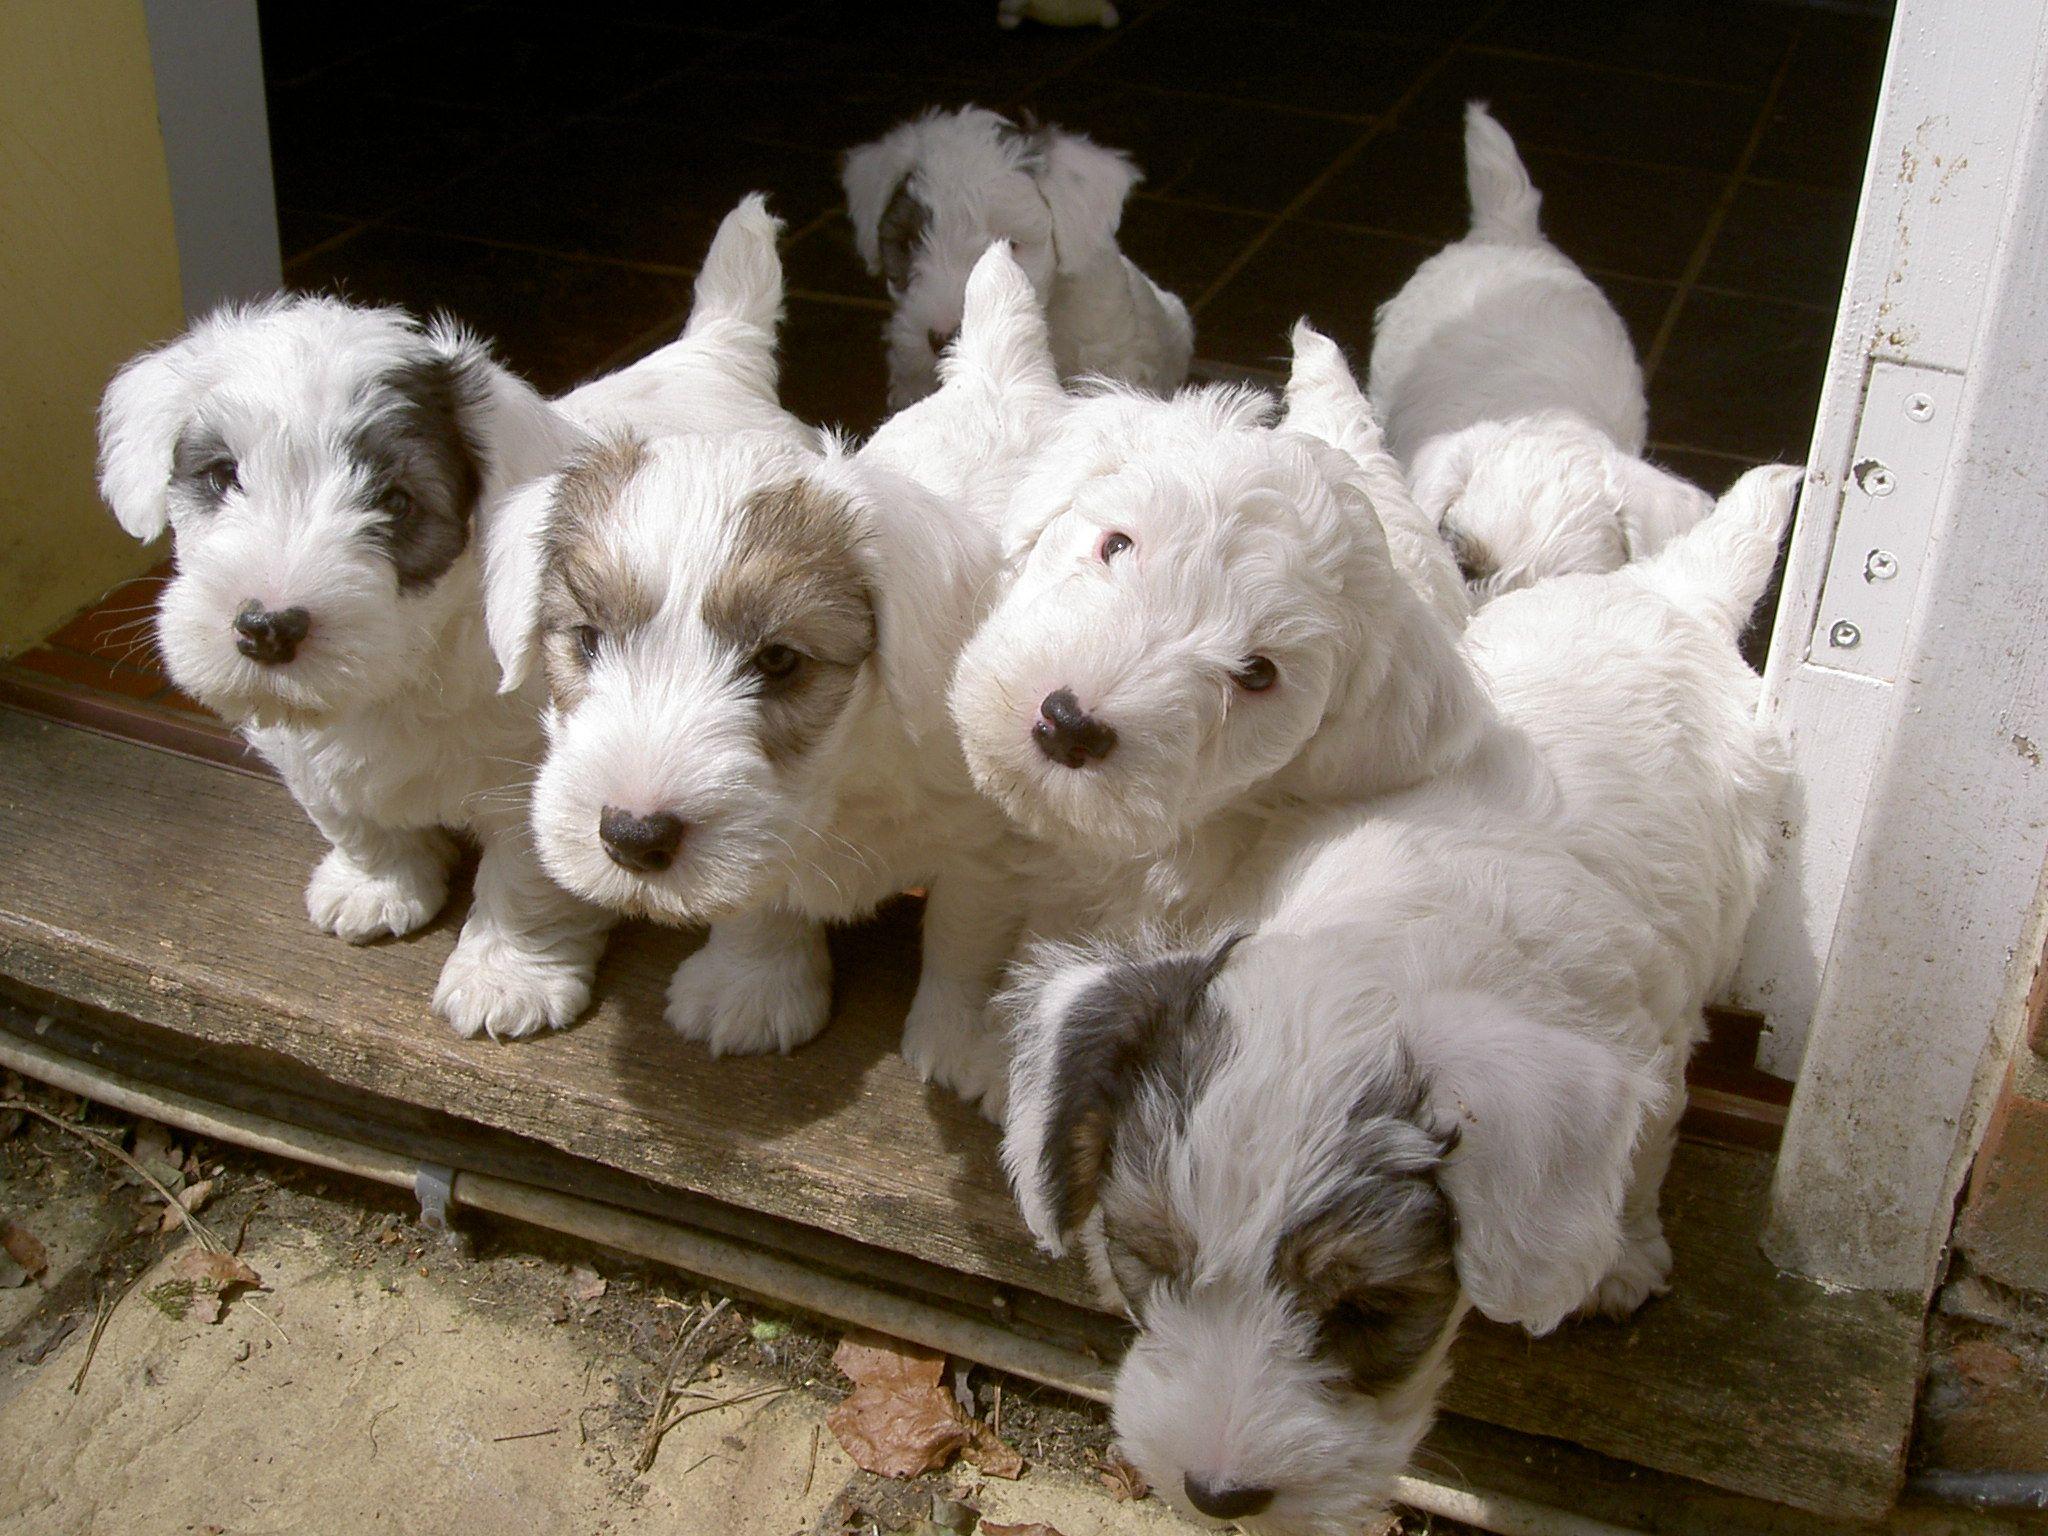 Save The Sealyham Terrier Terrier Breeds Sealyham Terrier Dogs